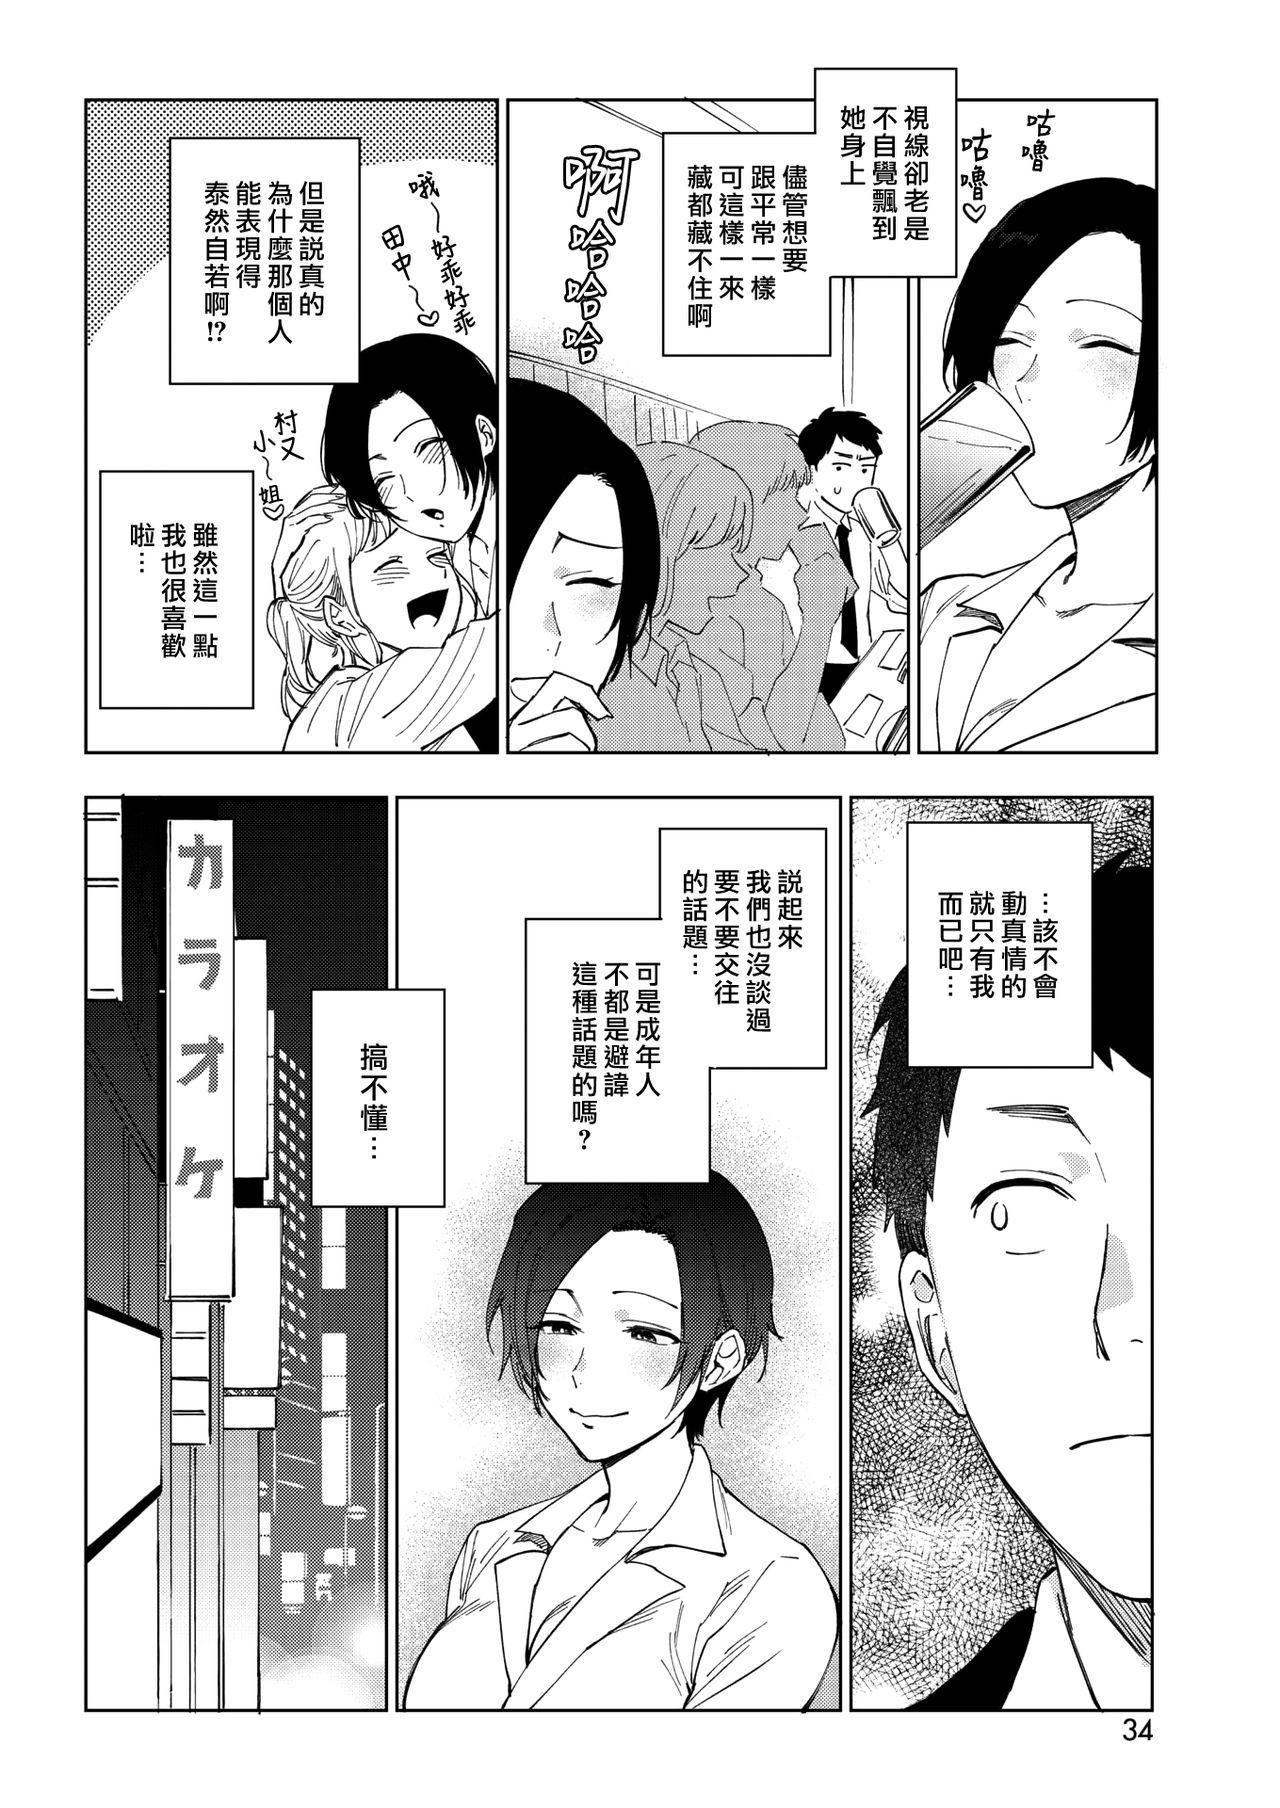 Muramata-san no Himitsu 2 | 村又小姐的秘密 2 3